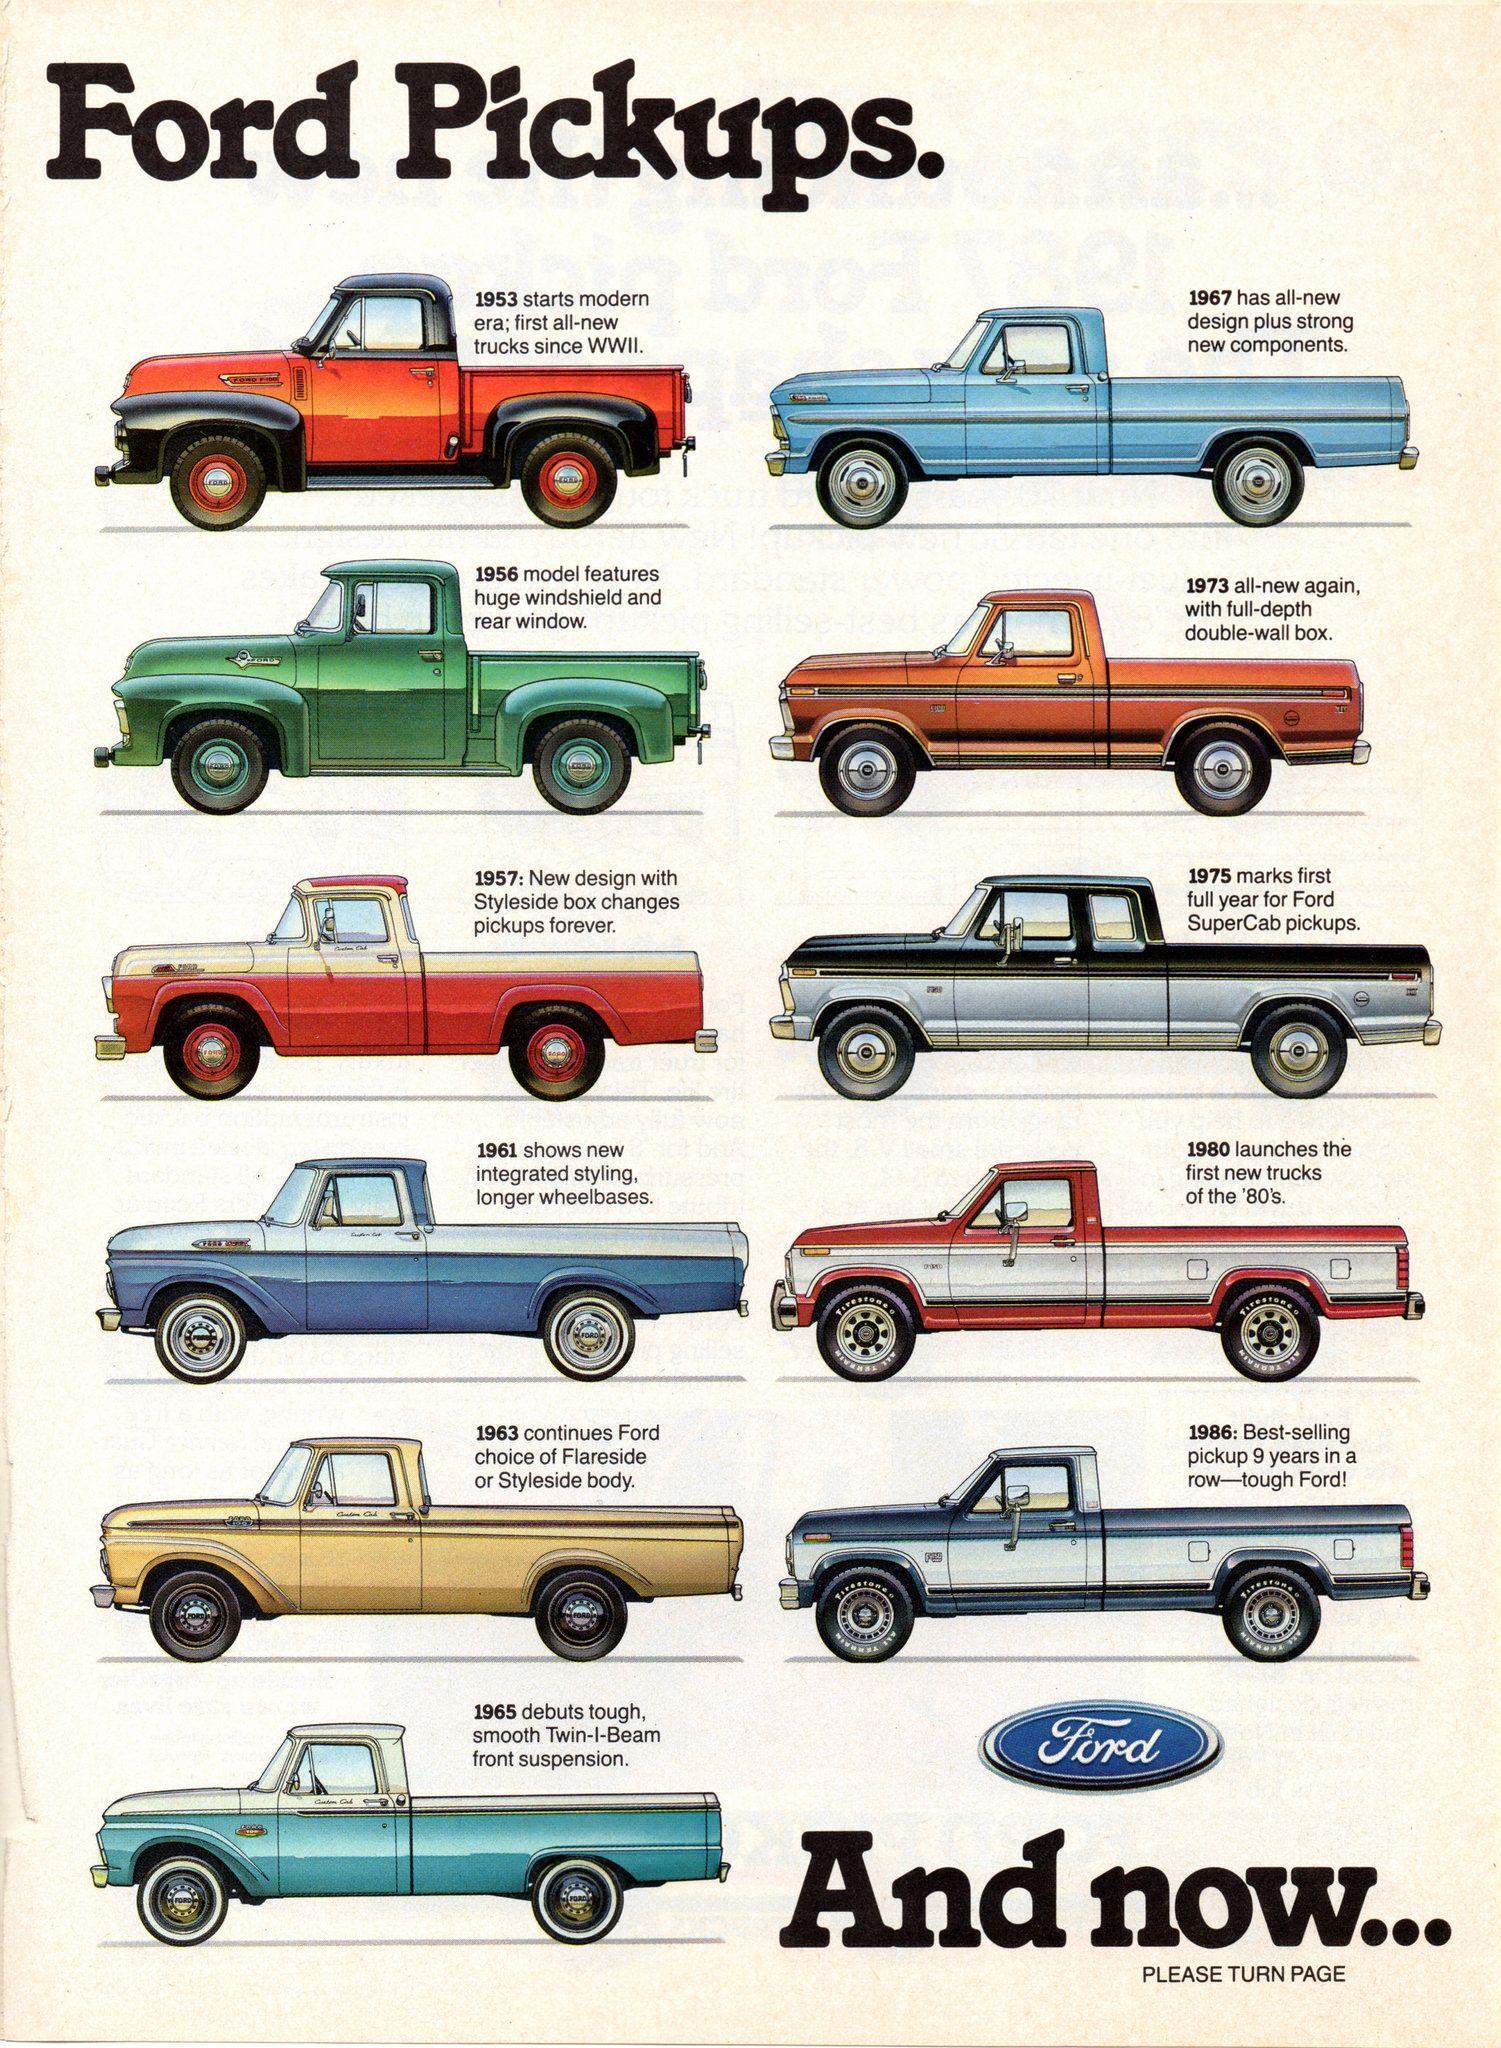 1987 Ford Truck Ad Pg 2 Ford Pickup Ford Pickup Trucks Classic Ford Trucks